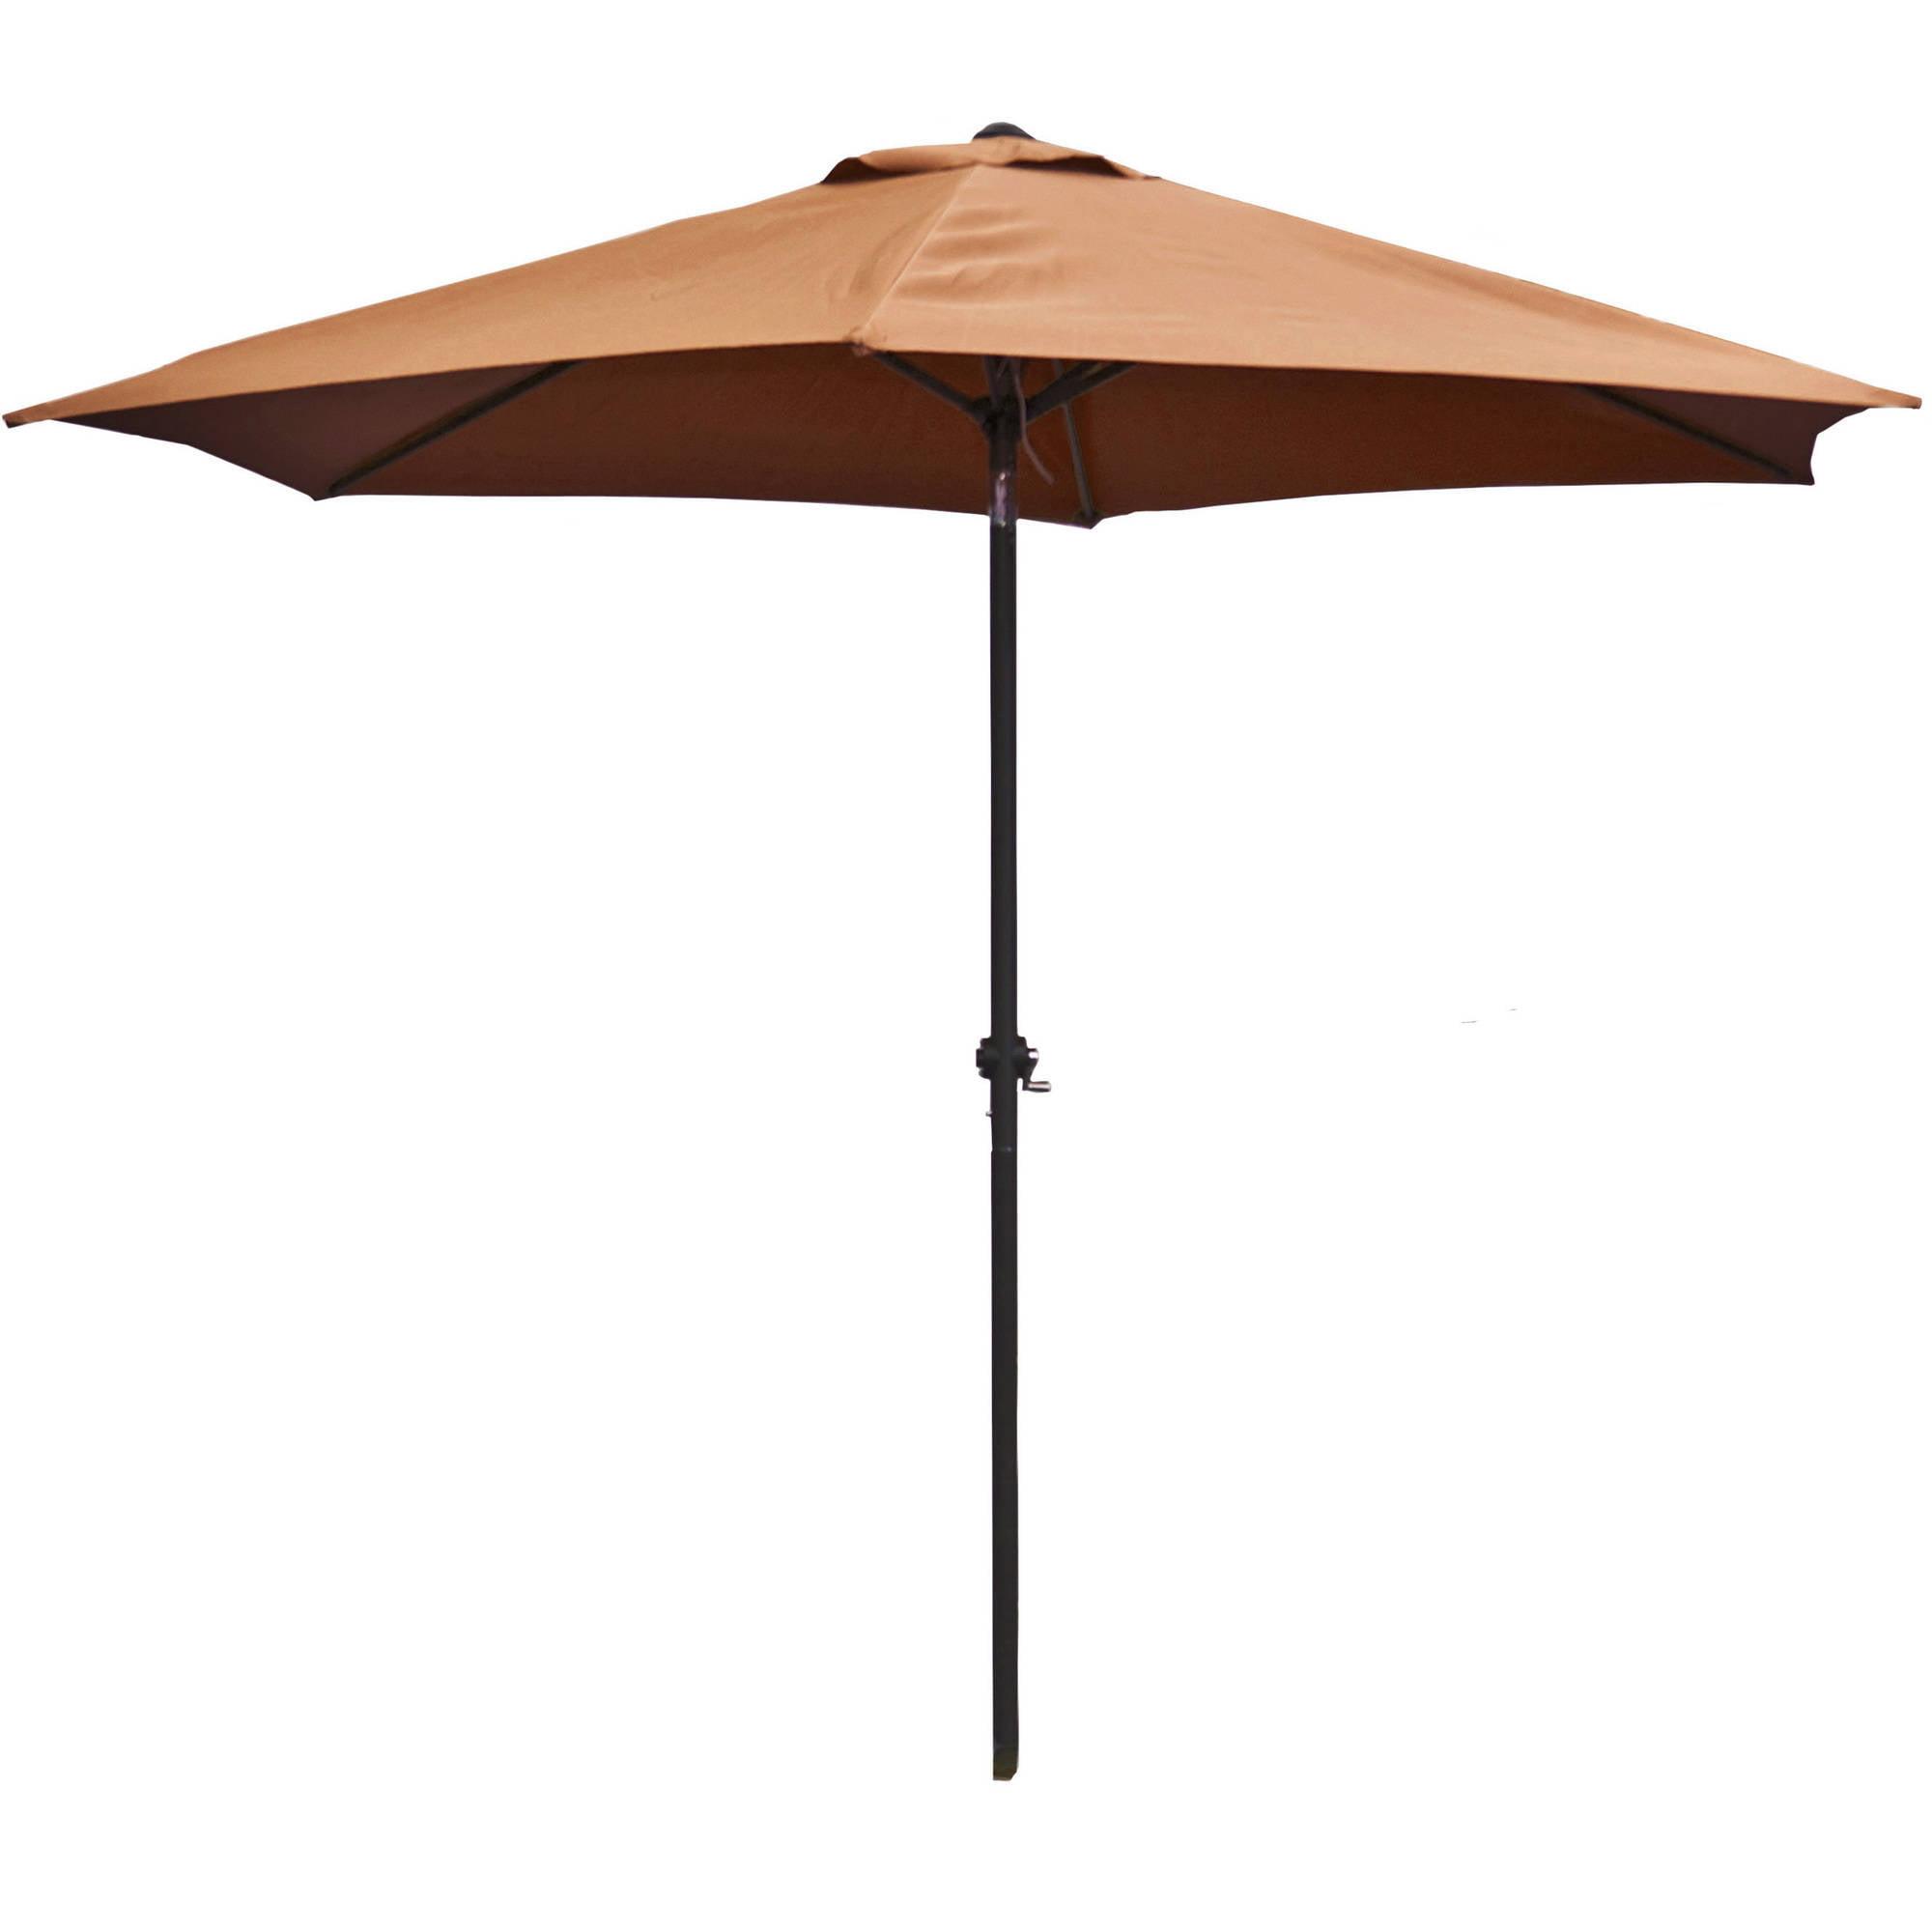 ALEKO UMB9FTTN 9' Outdoor Garden Patio Steel Umbrella by ALEKO